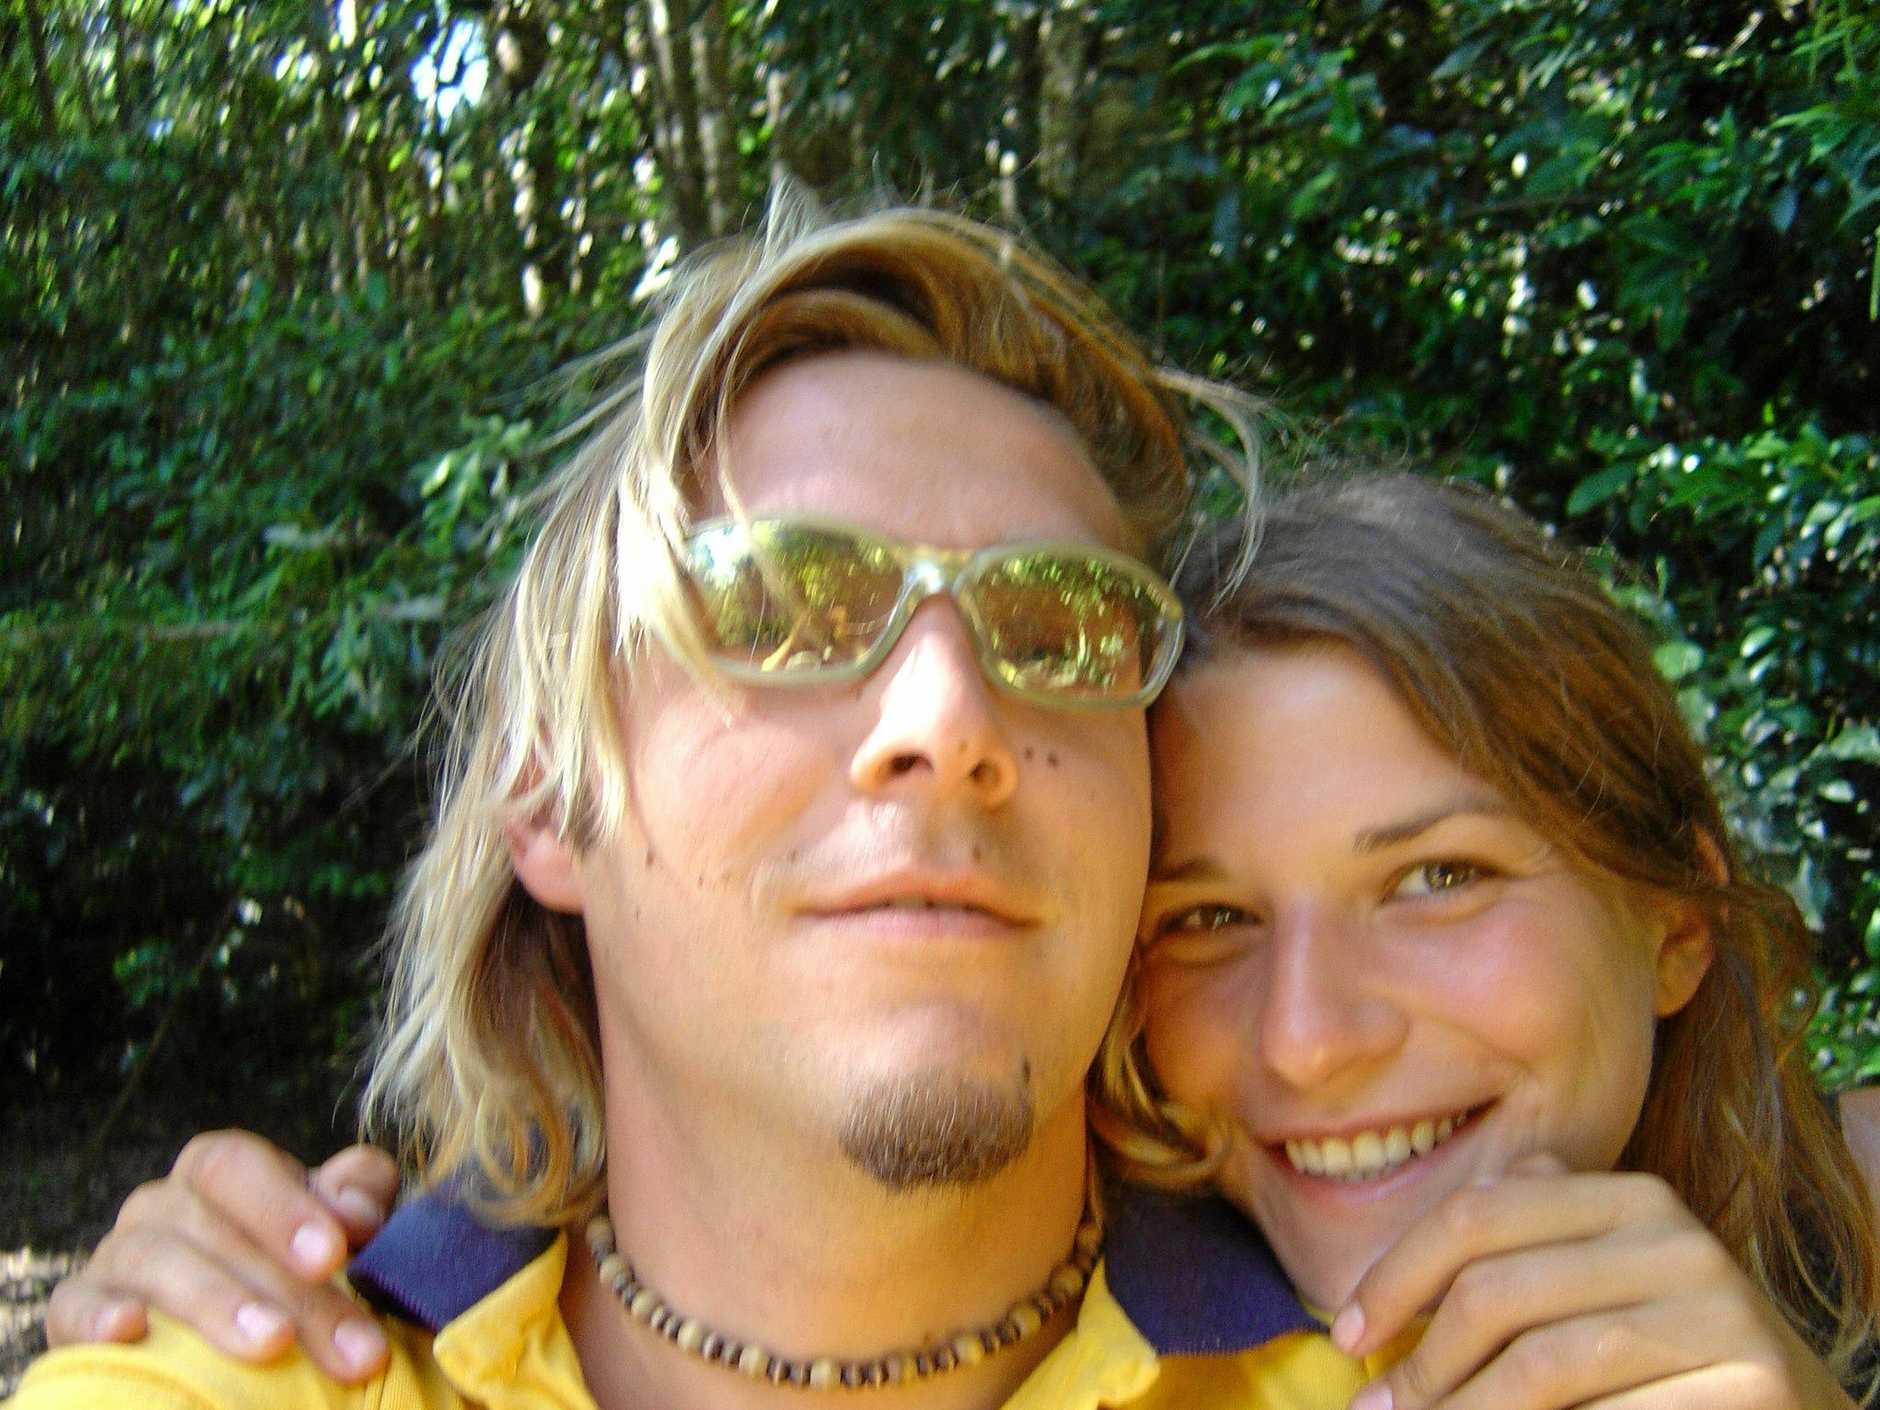 File photo Simone Strobel with Tobias Suckfuell. Photo Contributed